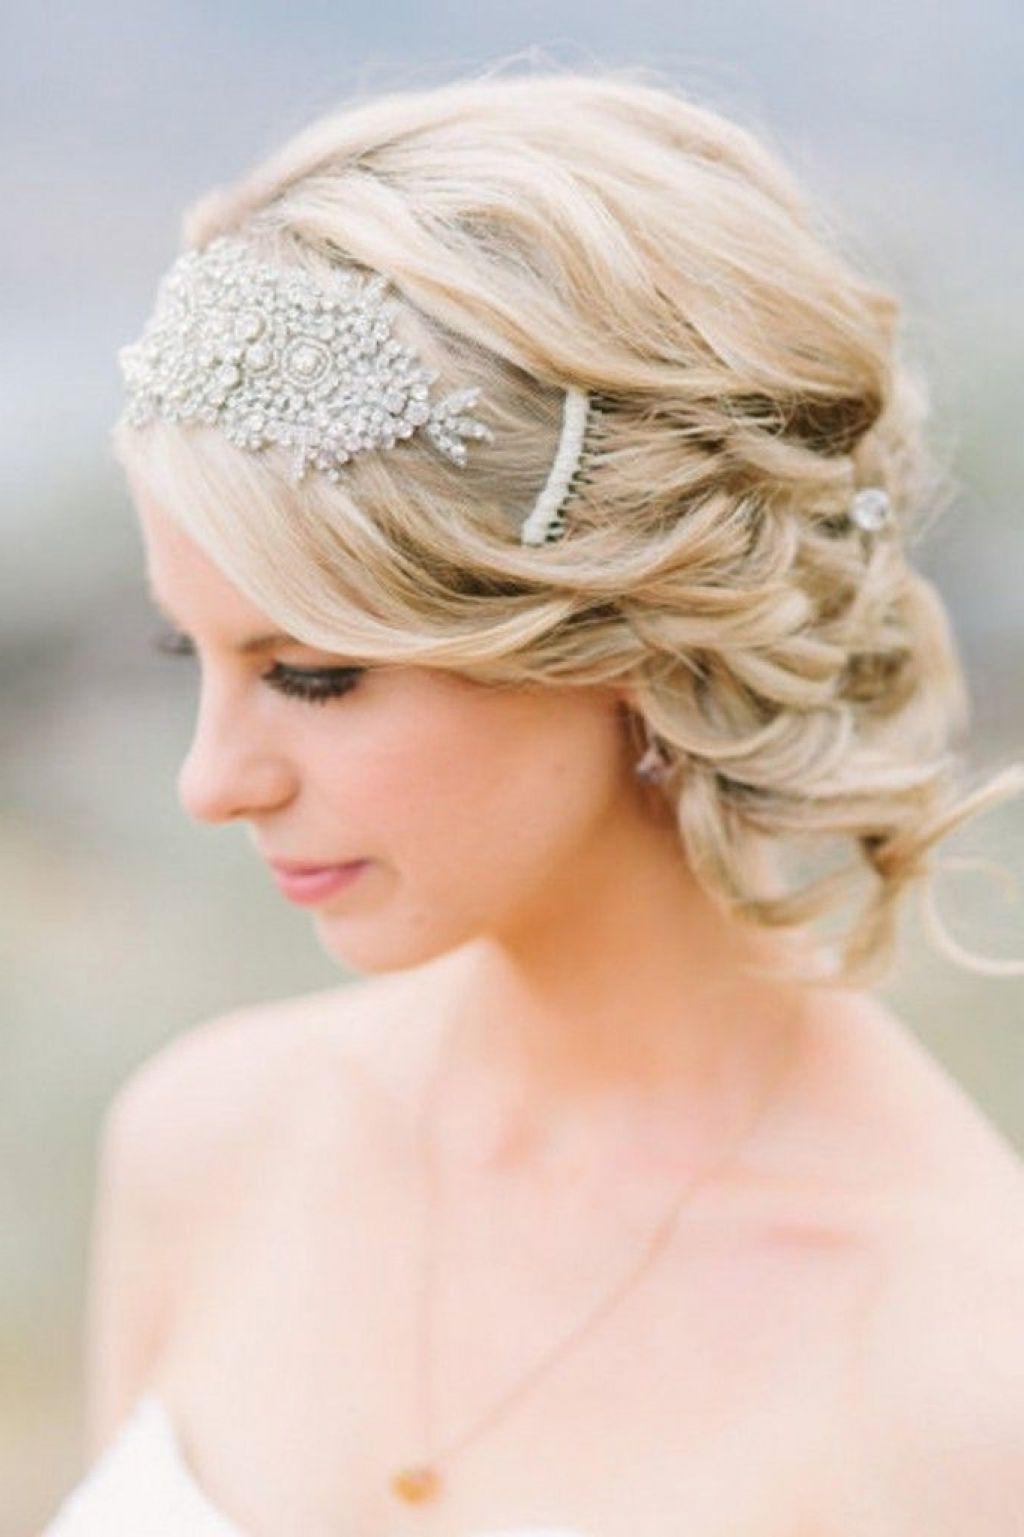 39++ Bridal hairstyles for short fine hair ideas